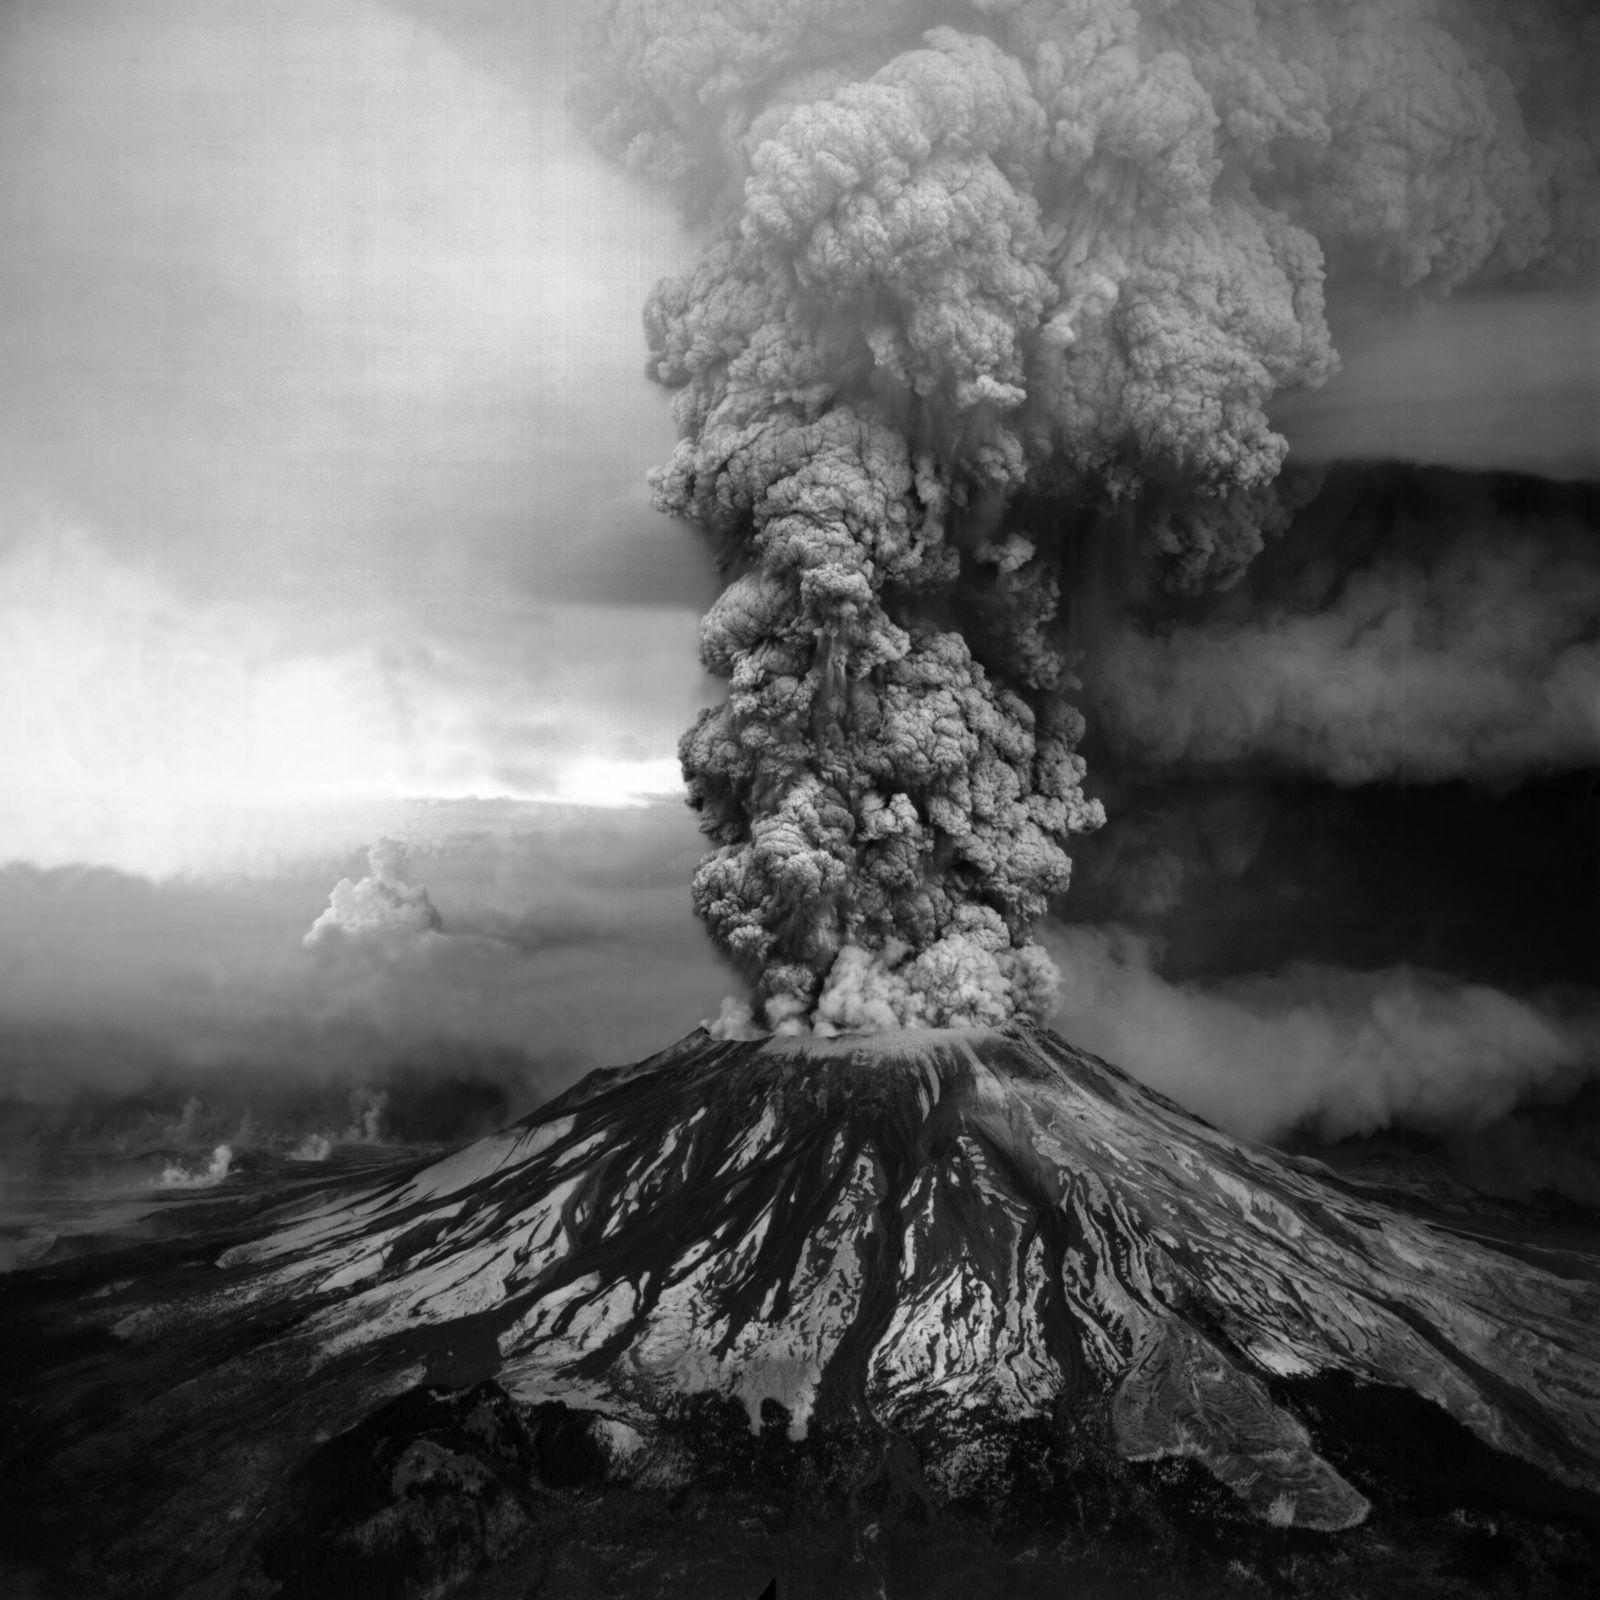 Mount St Helens - Mont Saint Helens - Eruption - Ash cloud - 18 mai 1980 - 05-18-1980 - USGS - Volcan - Volcano